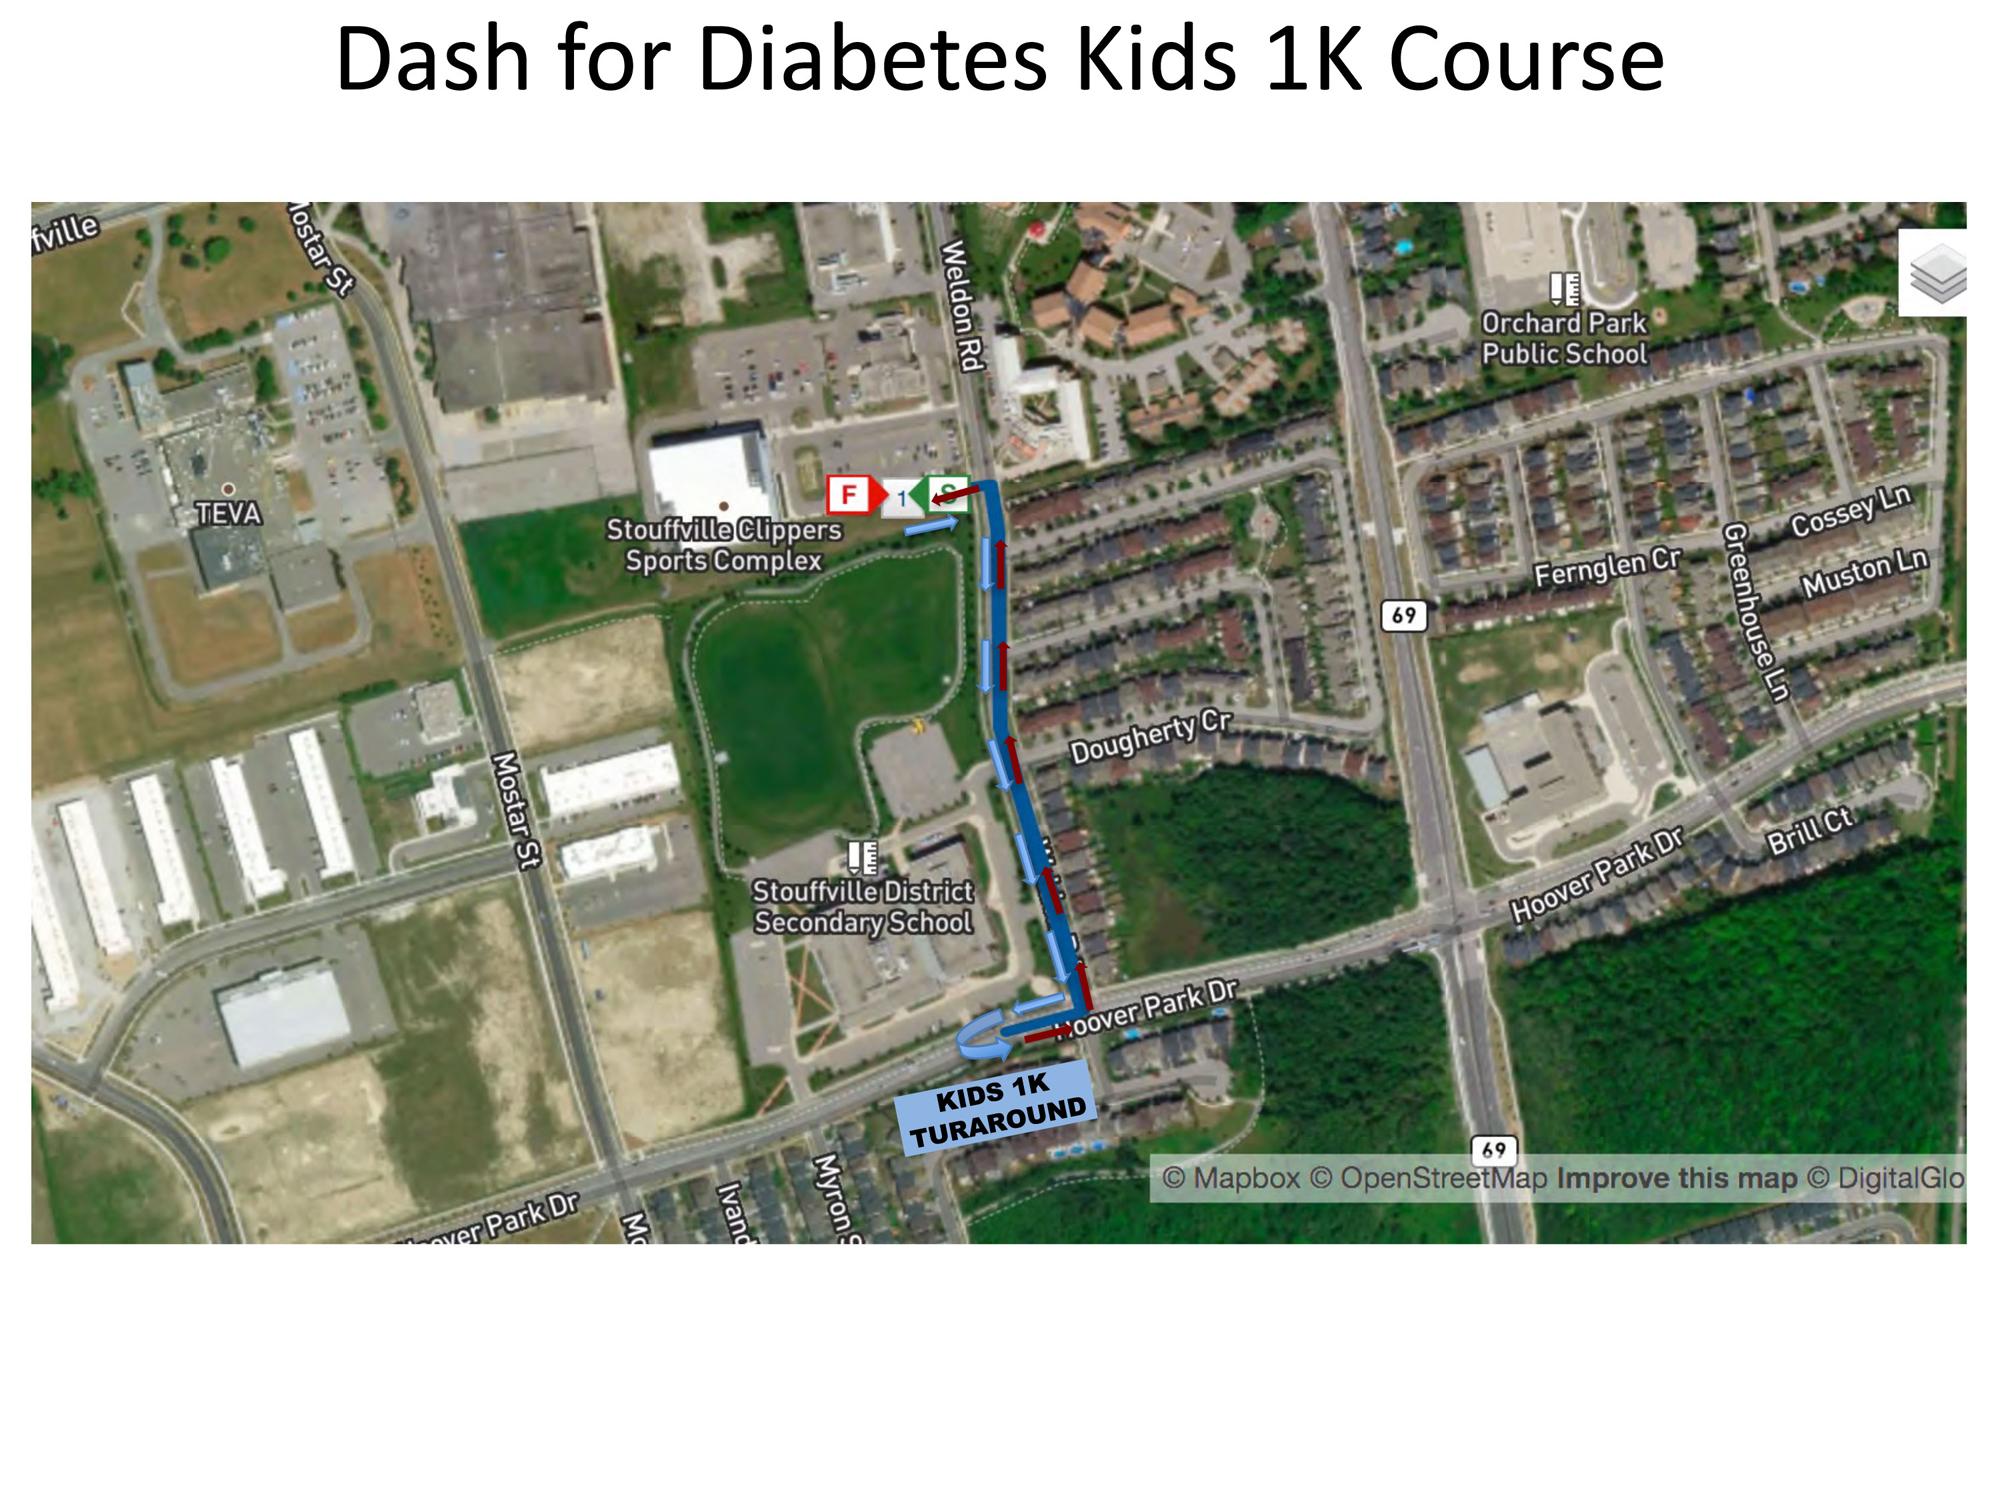 2019 Dashfor Diabetes Kids1 KMap